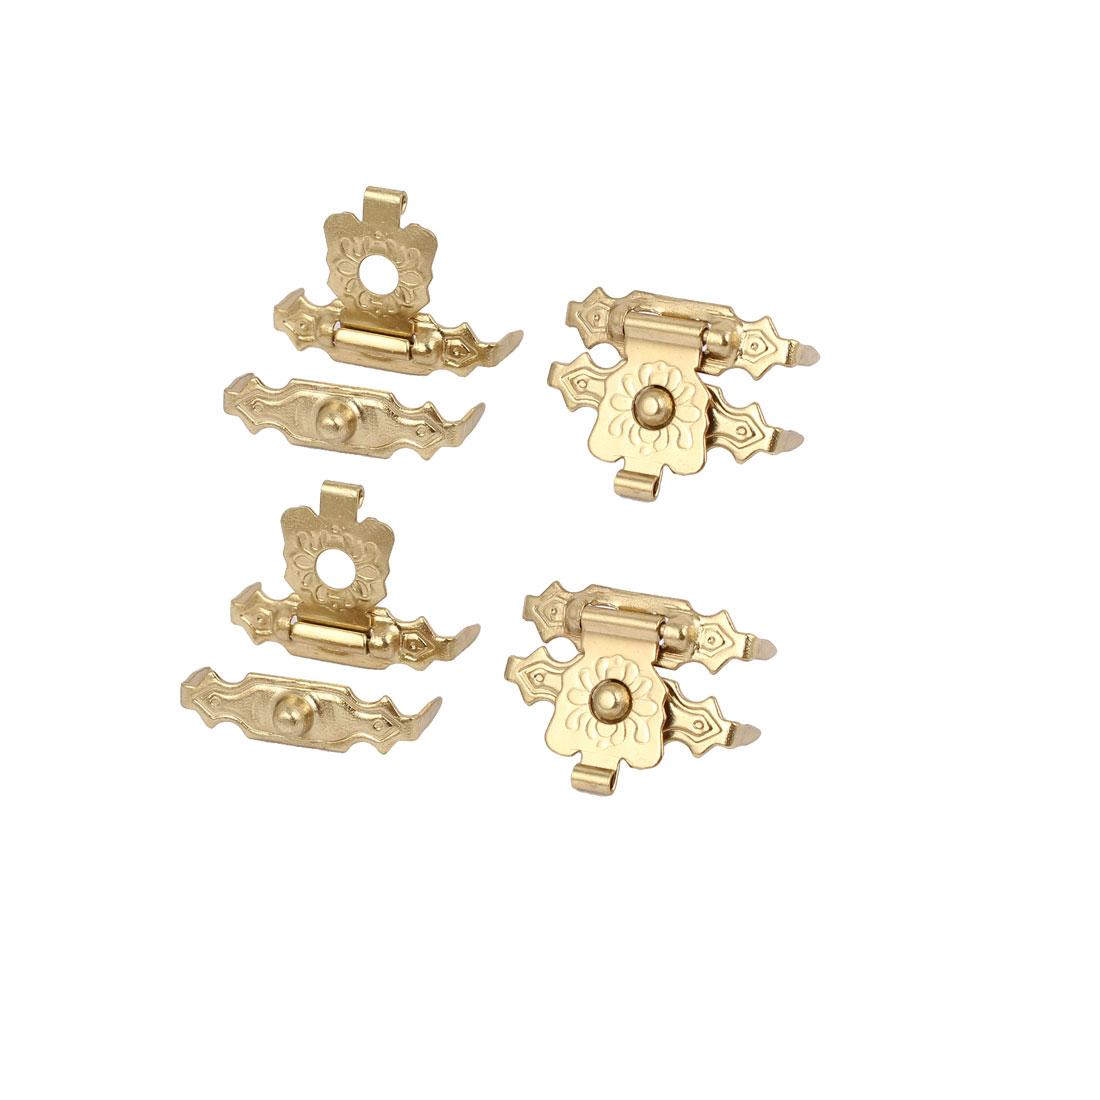 Box Wooden Case Metal Hasp Hook Lock Lid Latch Catch Gold Tone 4pcs